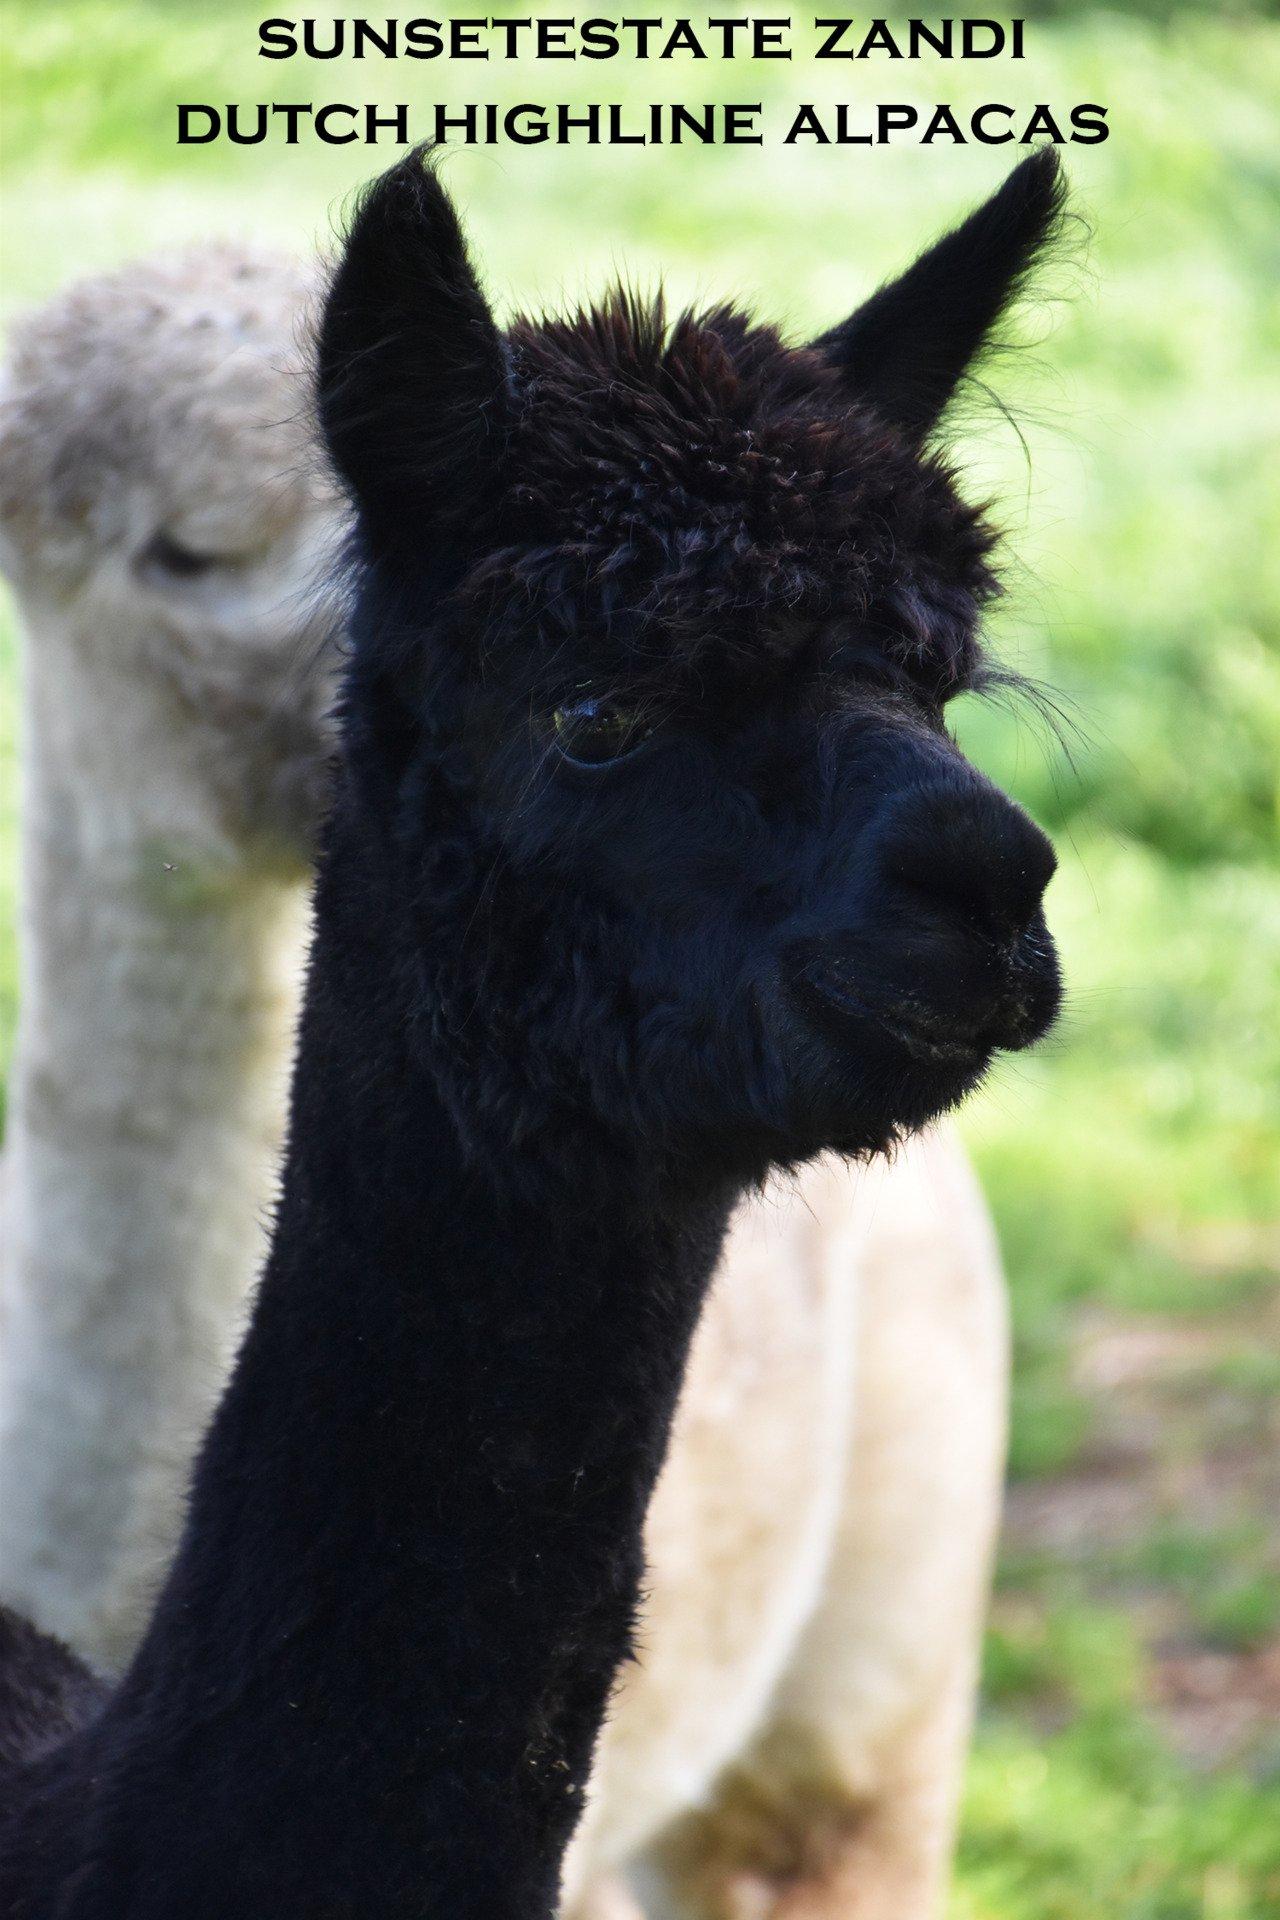 SUNSETESTATE ZANDI — aangeboden door Dutch Highline Alpacas